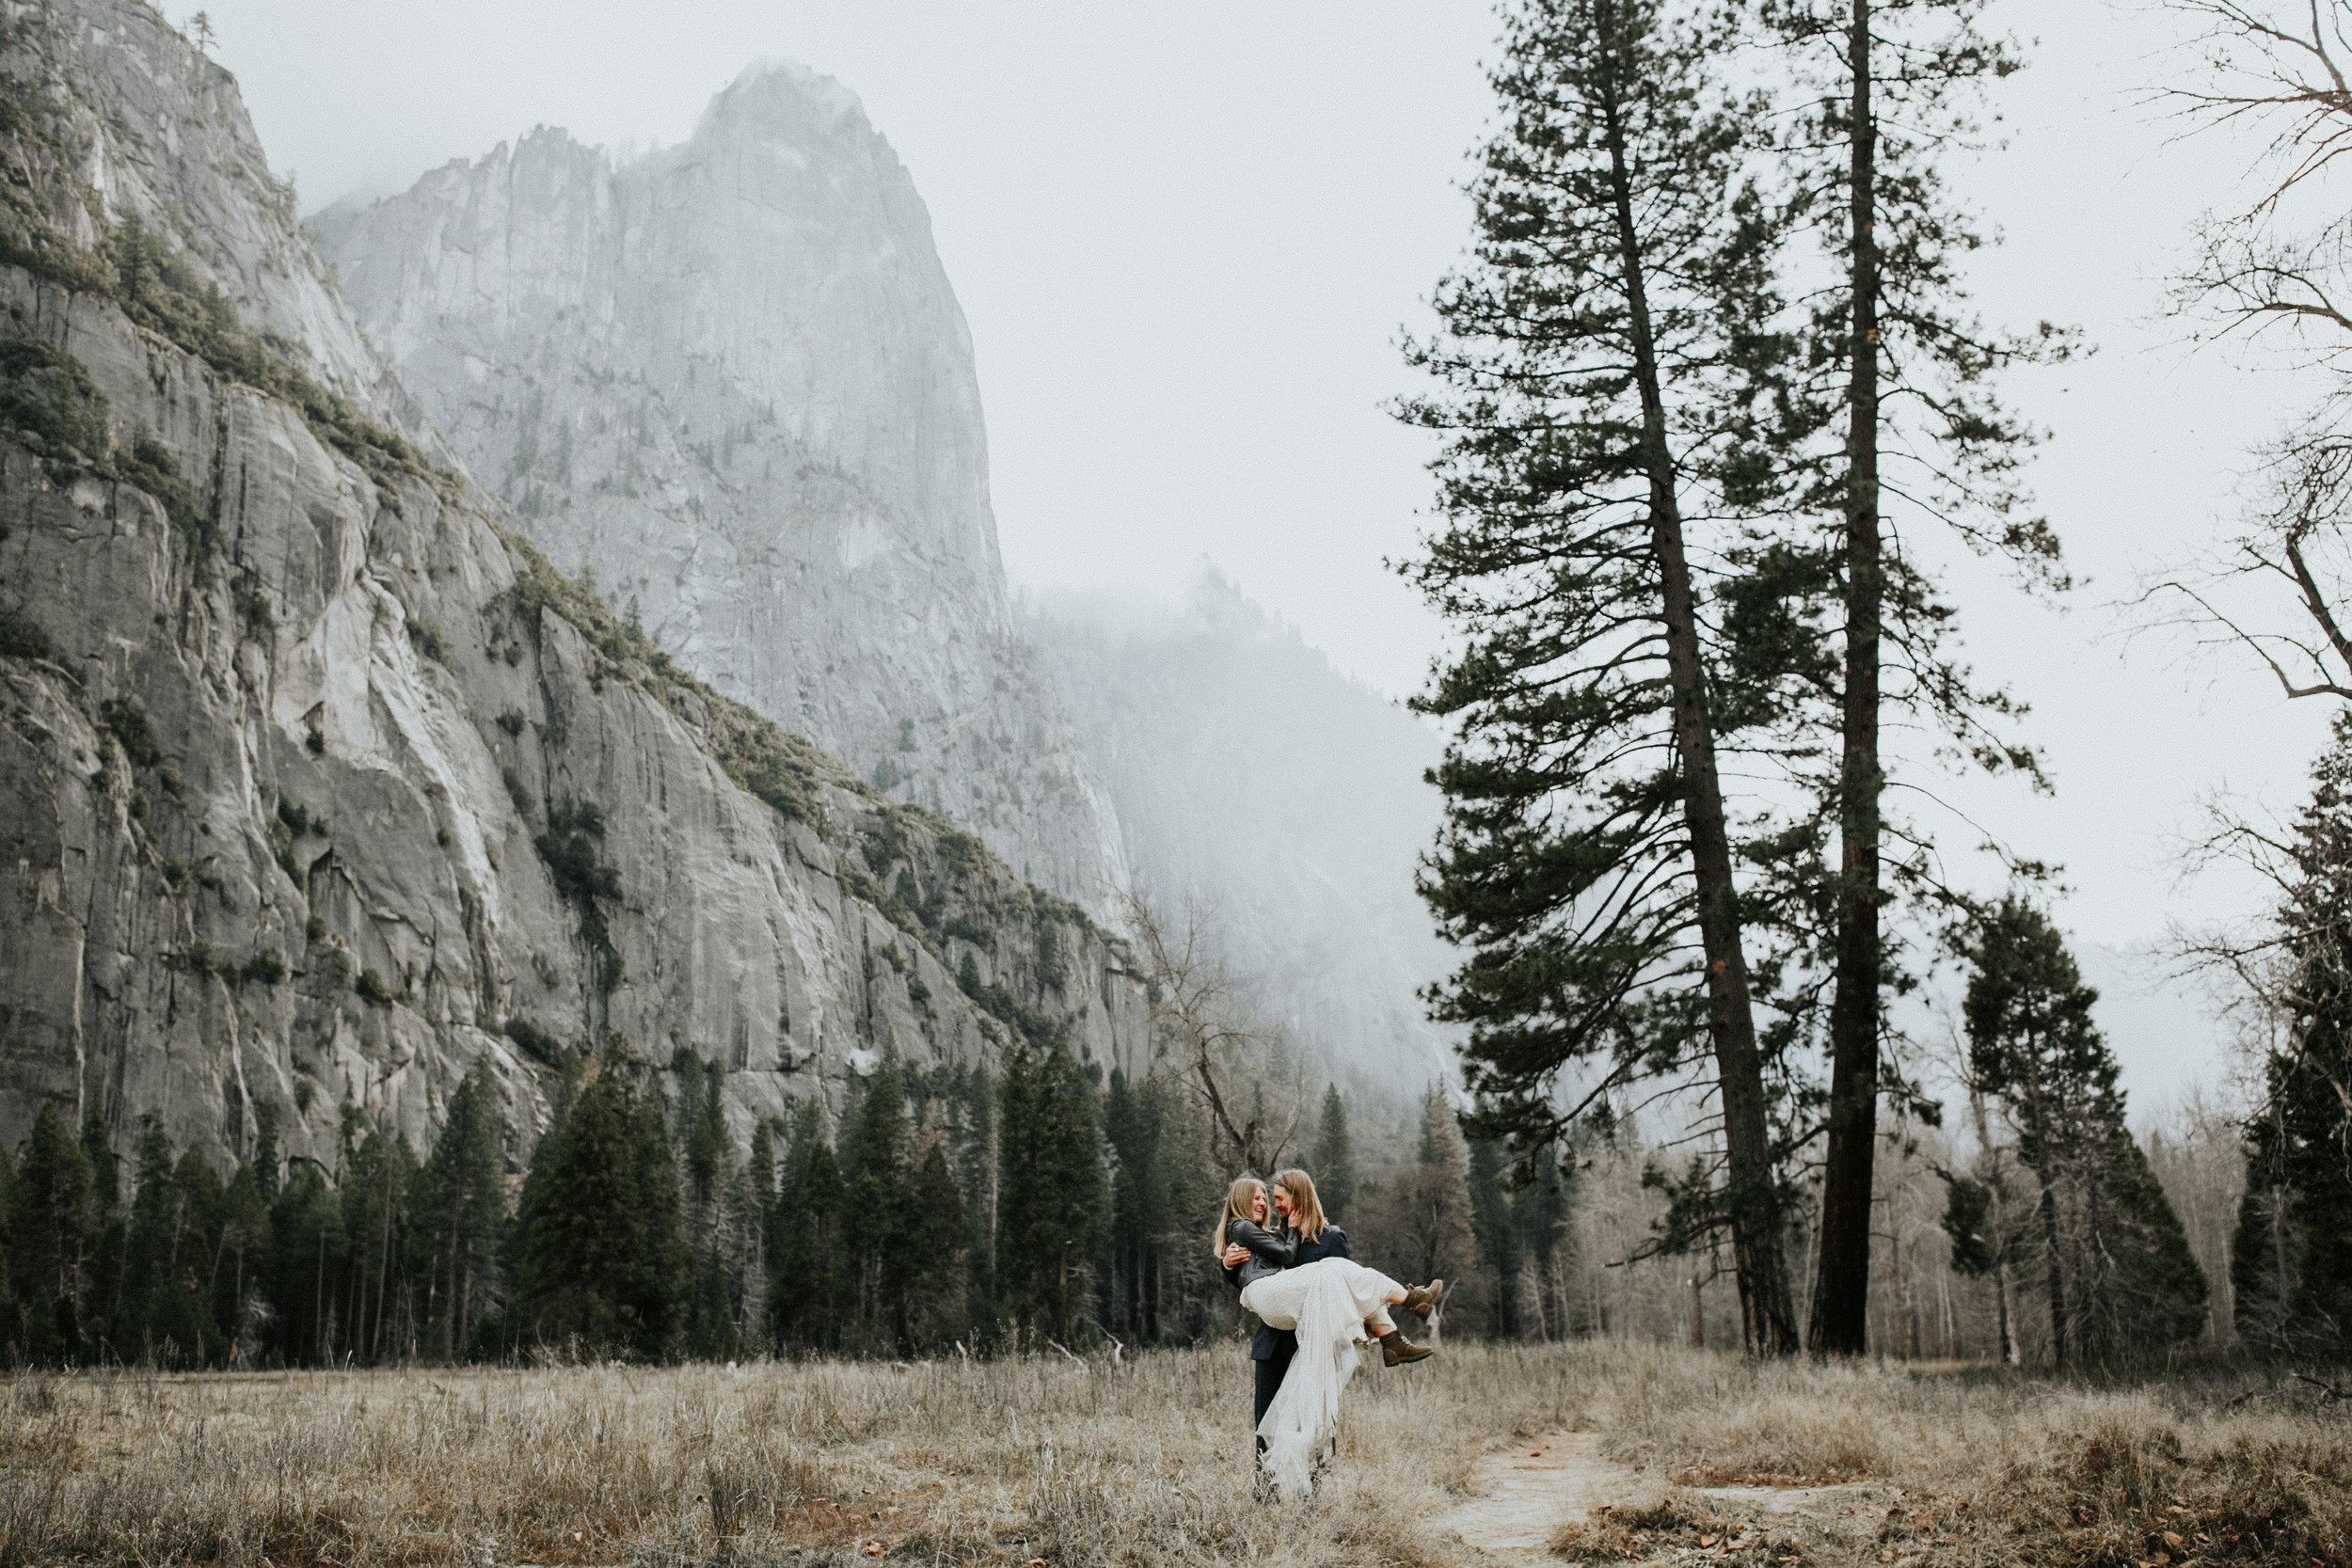 adventure-california-yosemite-photographer-grace-t-photography-79.jpg